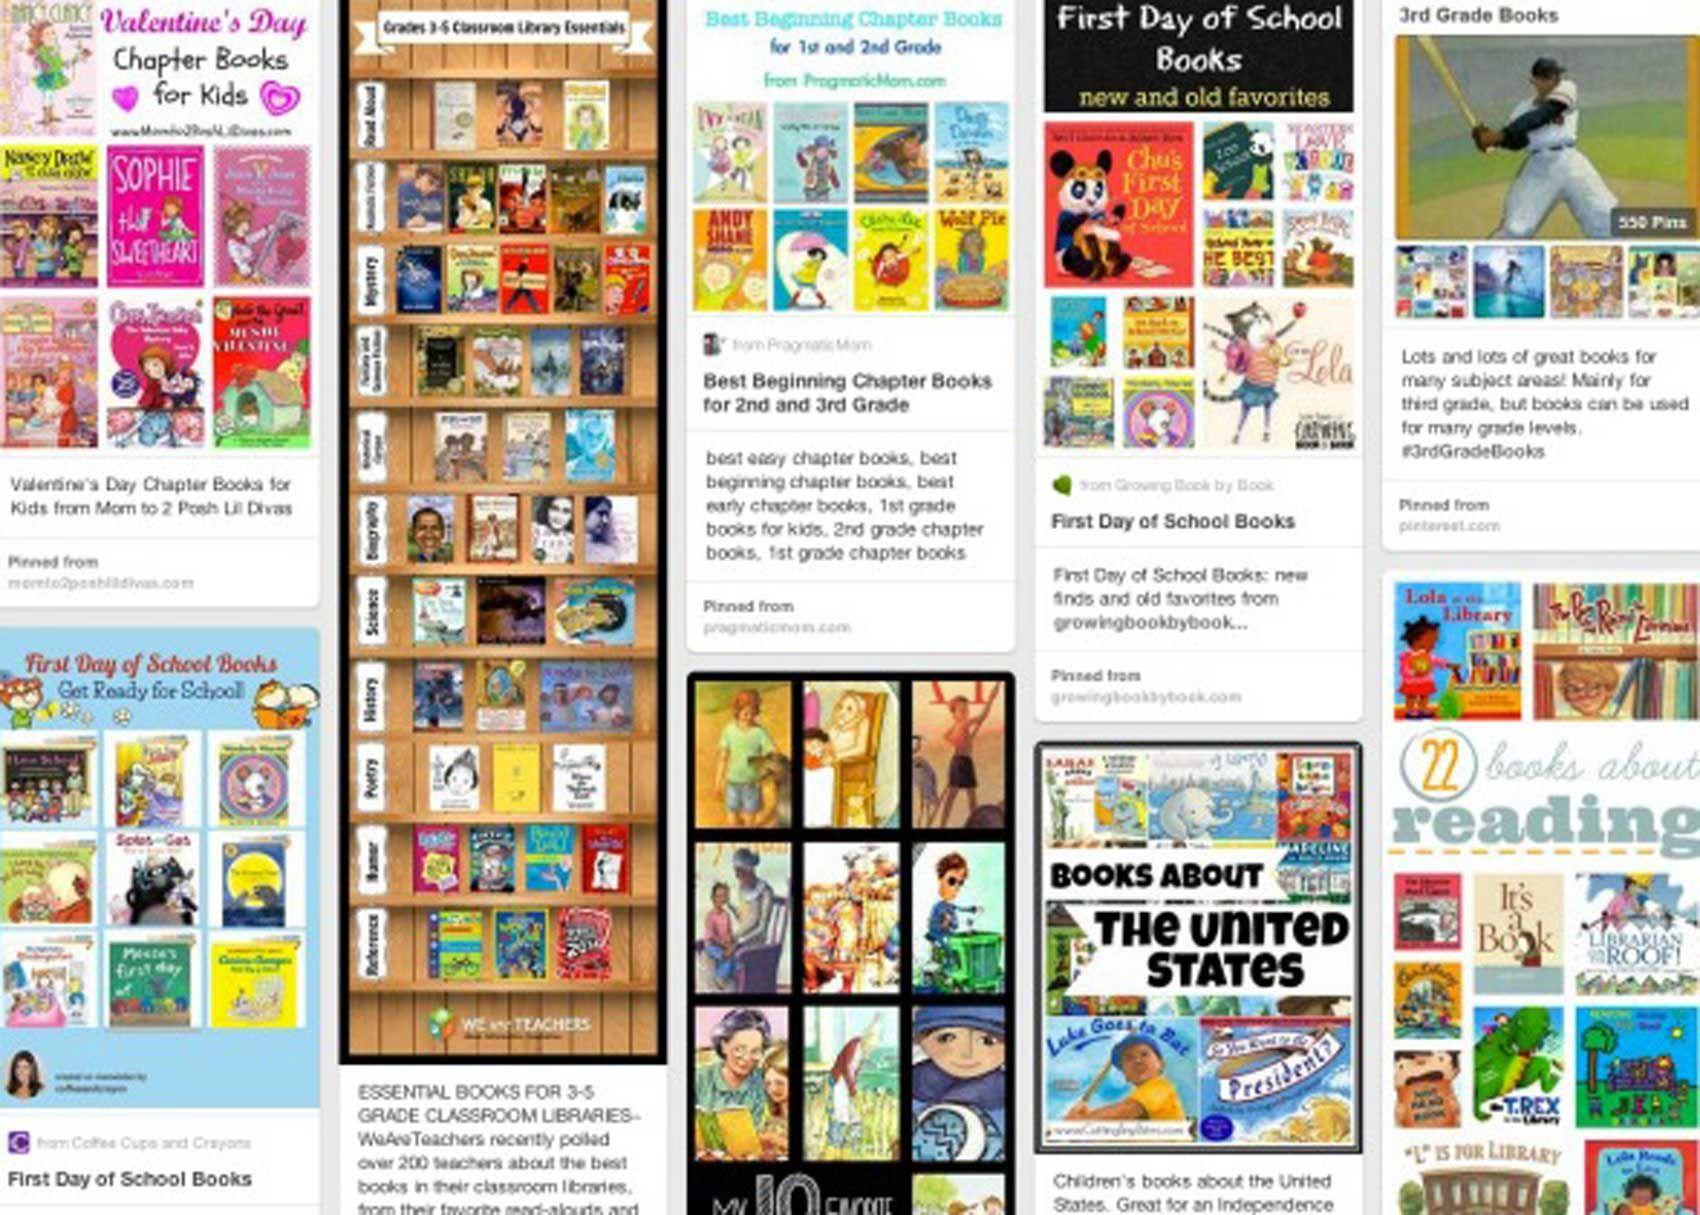 Best Pinterest Boards For Children S Books And Reading Brightly 3rd Grade Books Books Grade Book